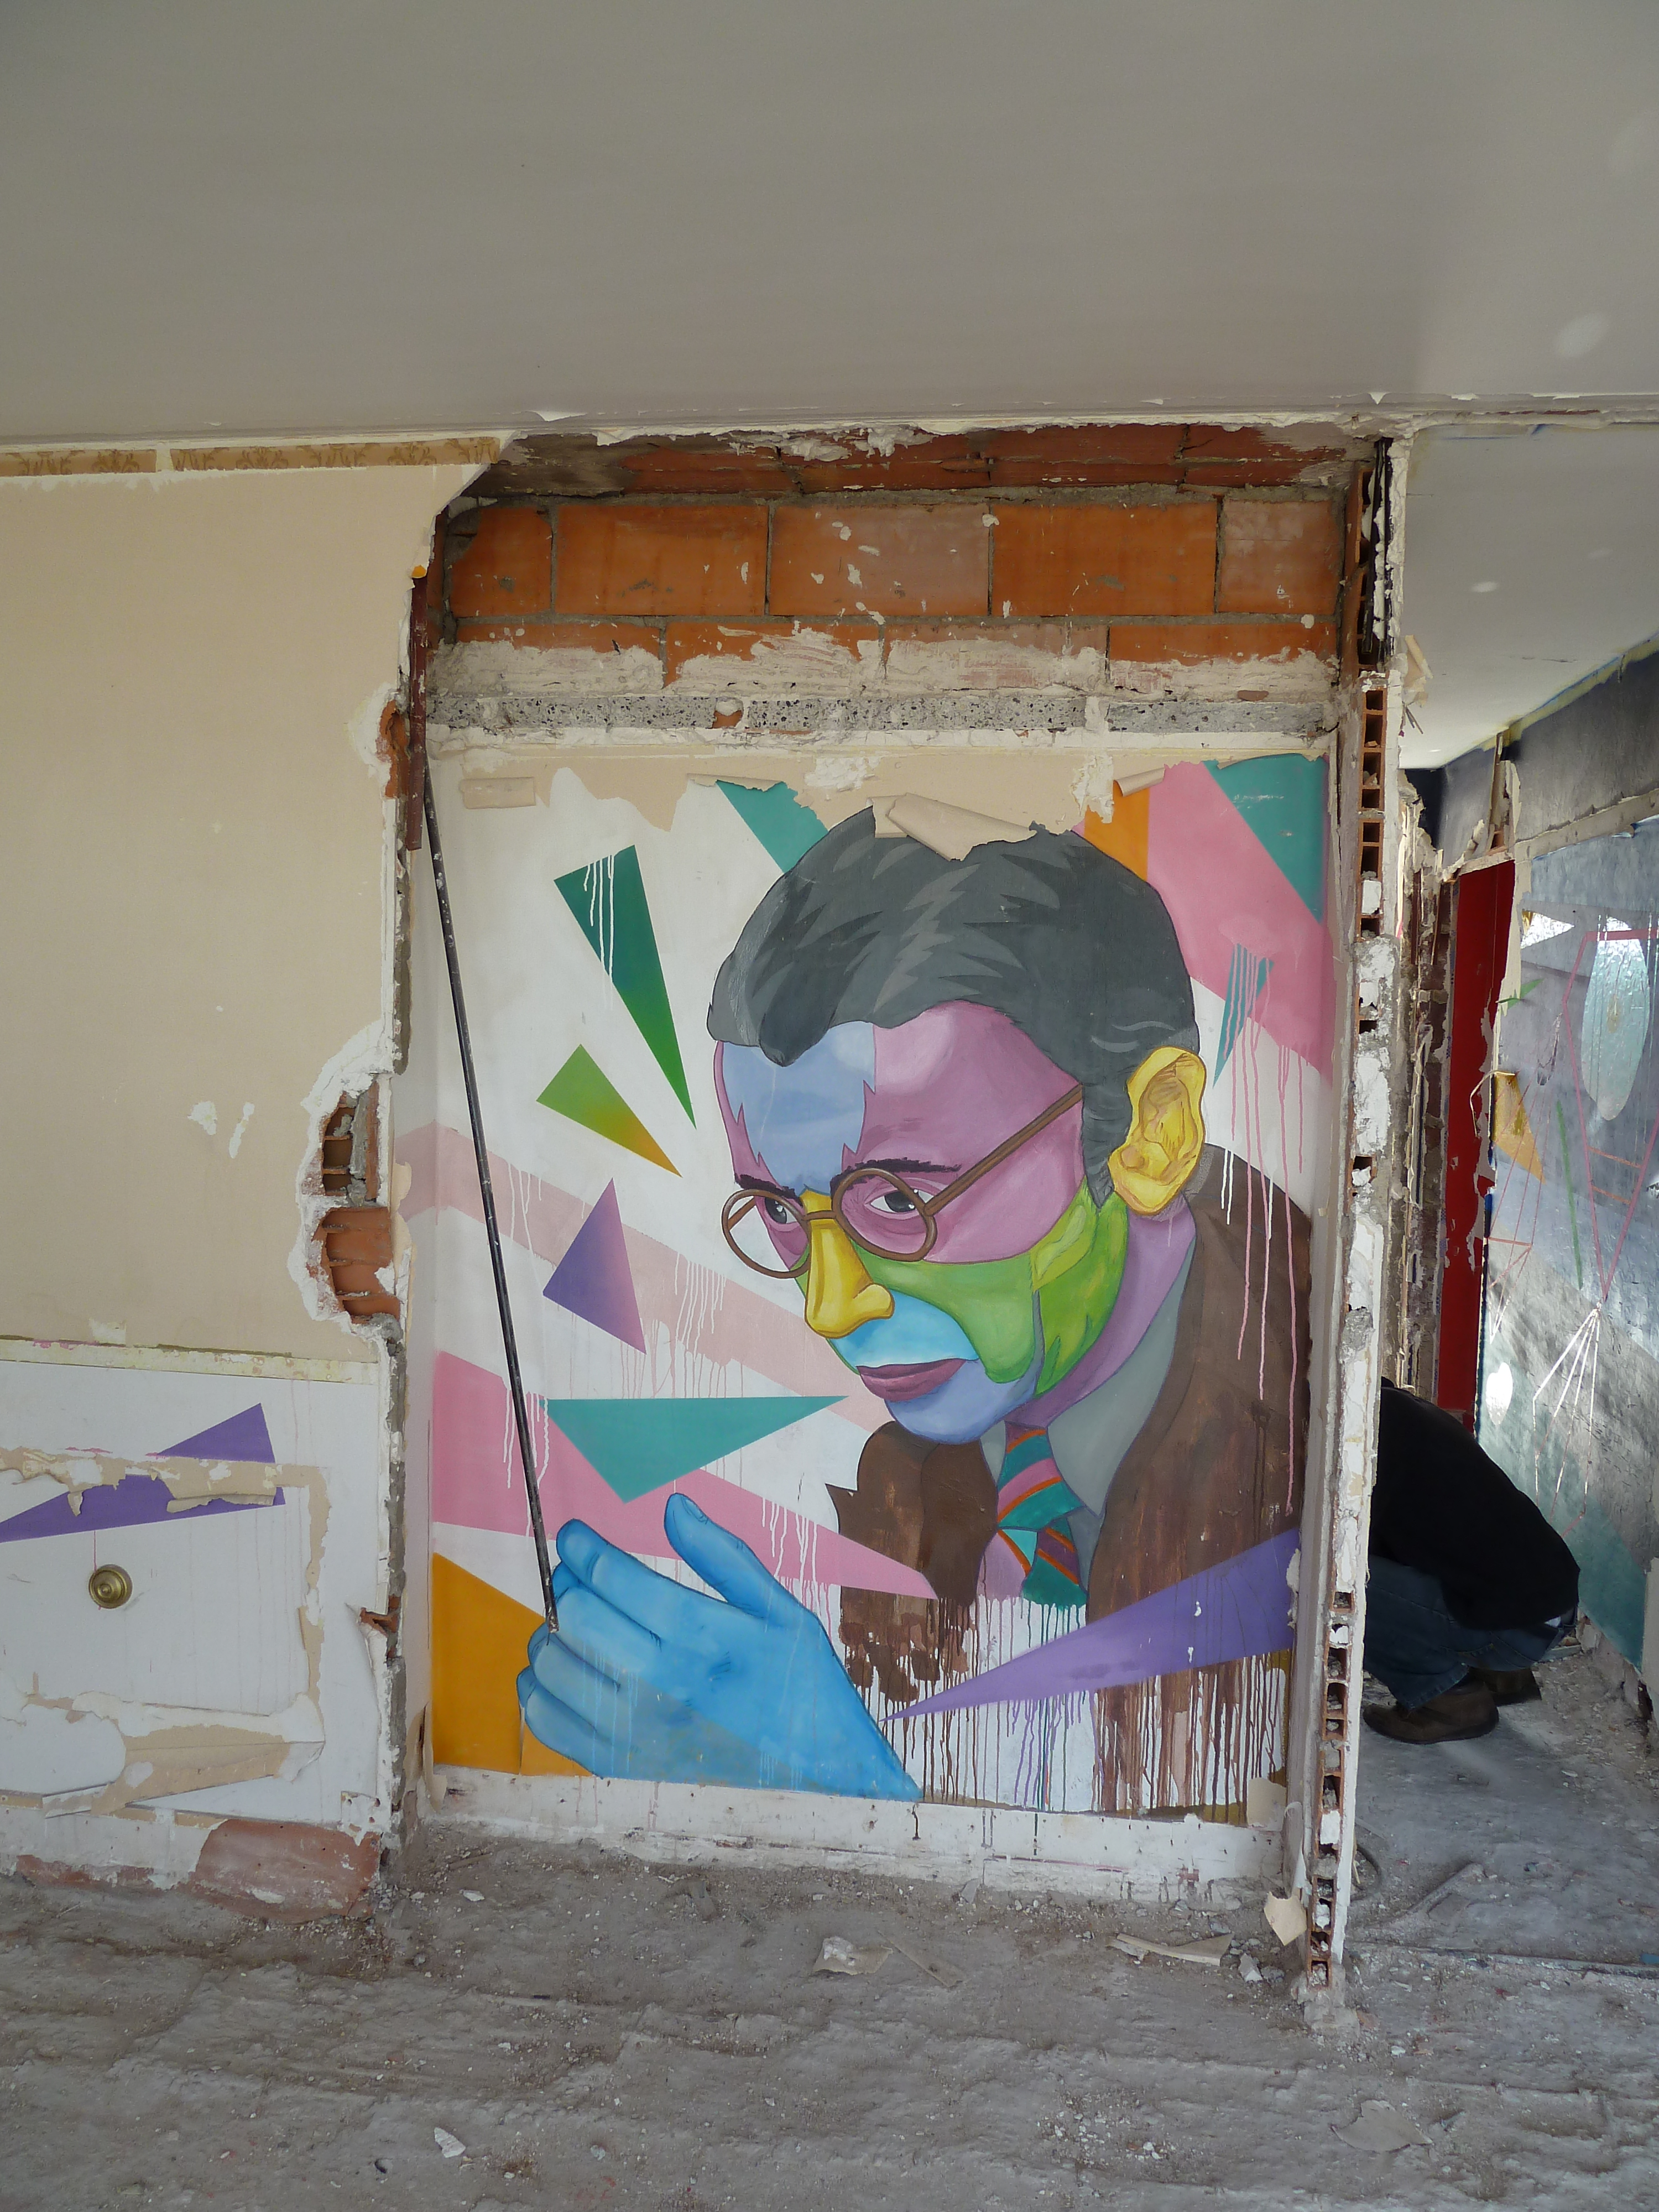 Jean-Paul Sartre ?